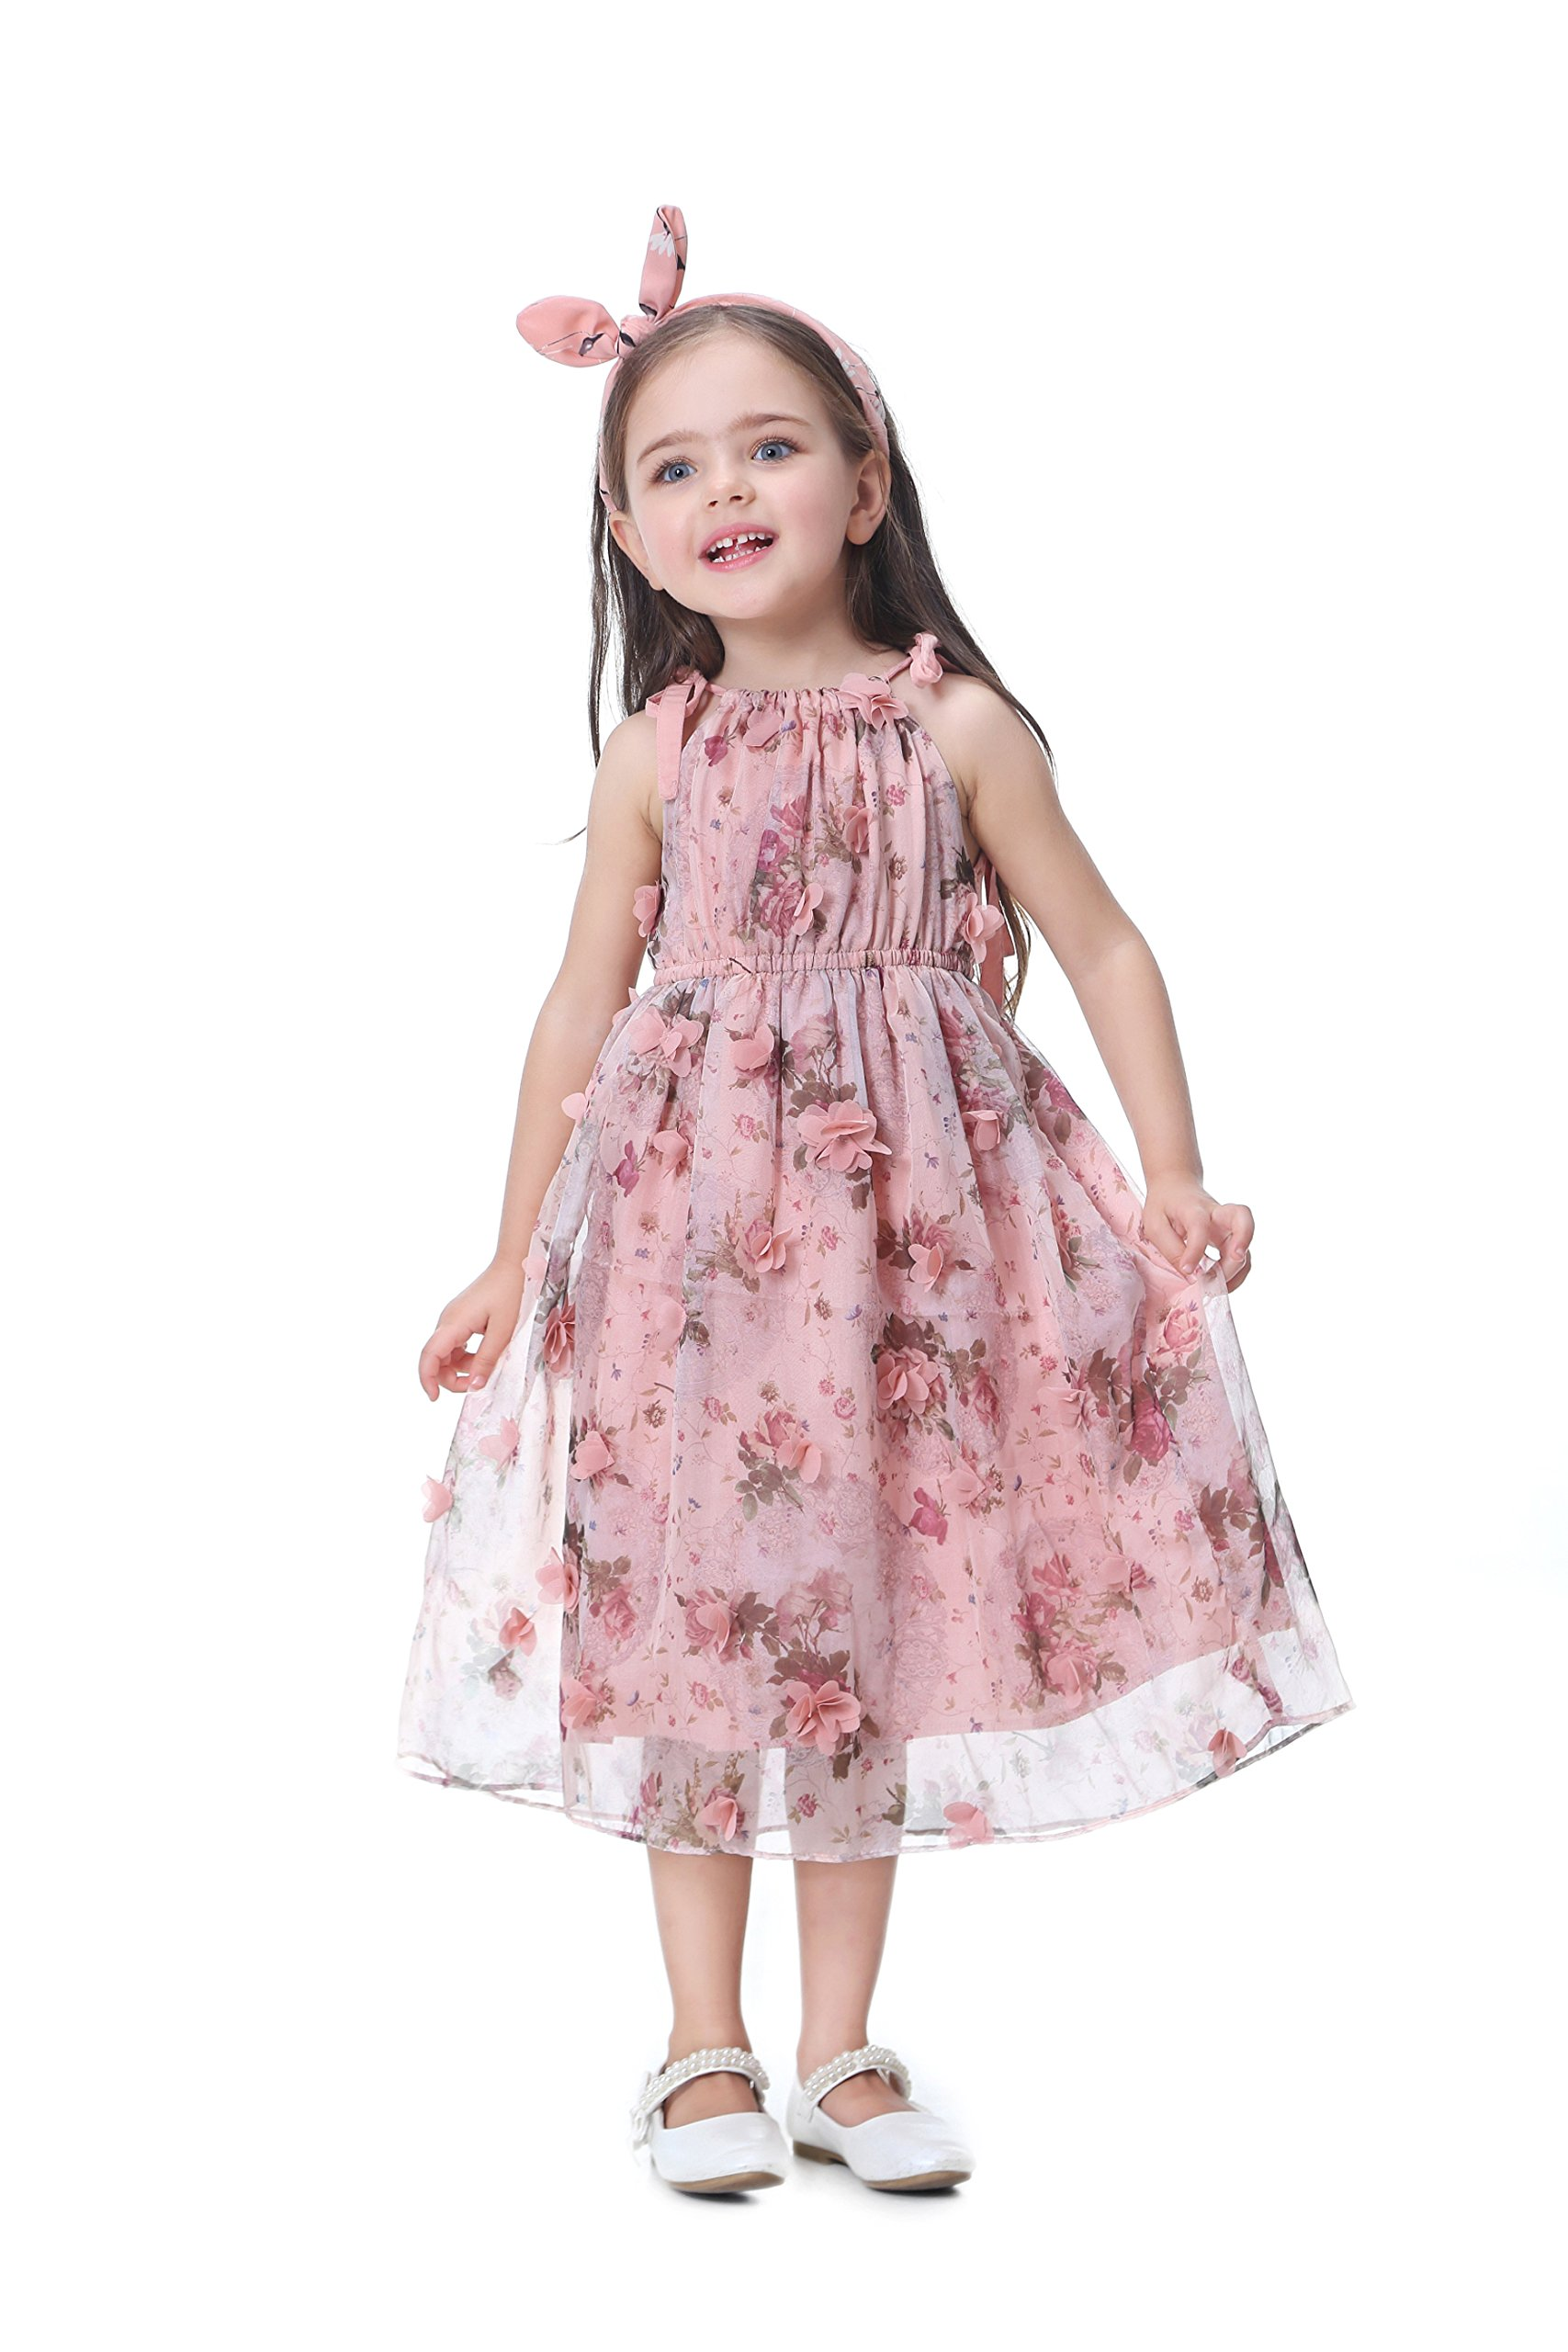 Flofallzique Flower Girls Dress Baby Girls Dress Floral Birthday Dress for for 1-6 Years Old(4, Light Pink)